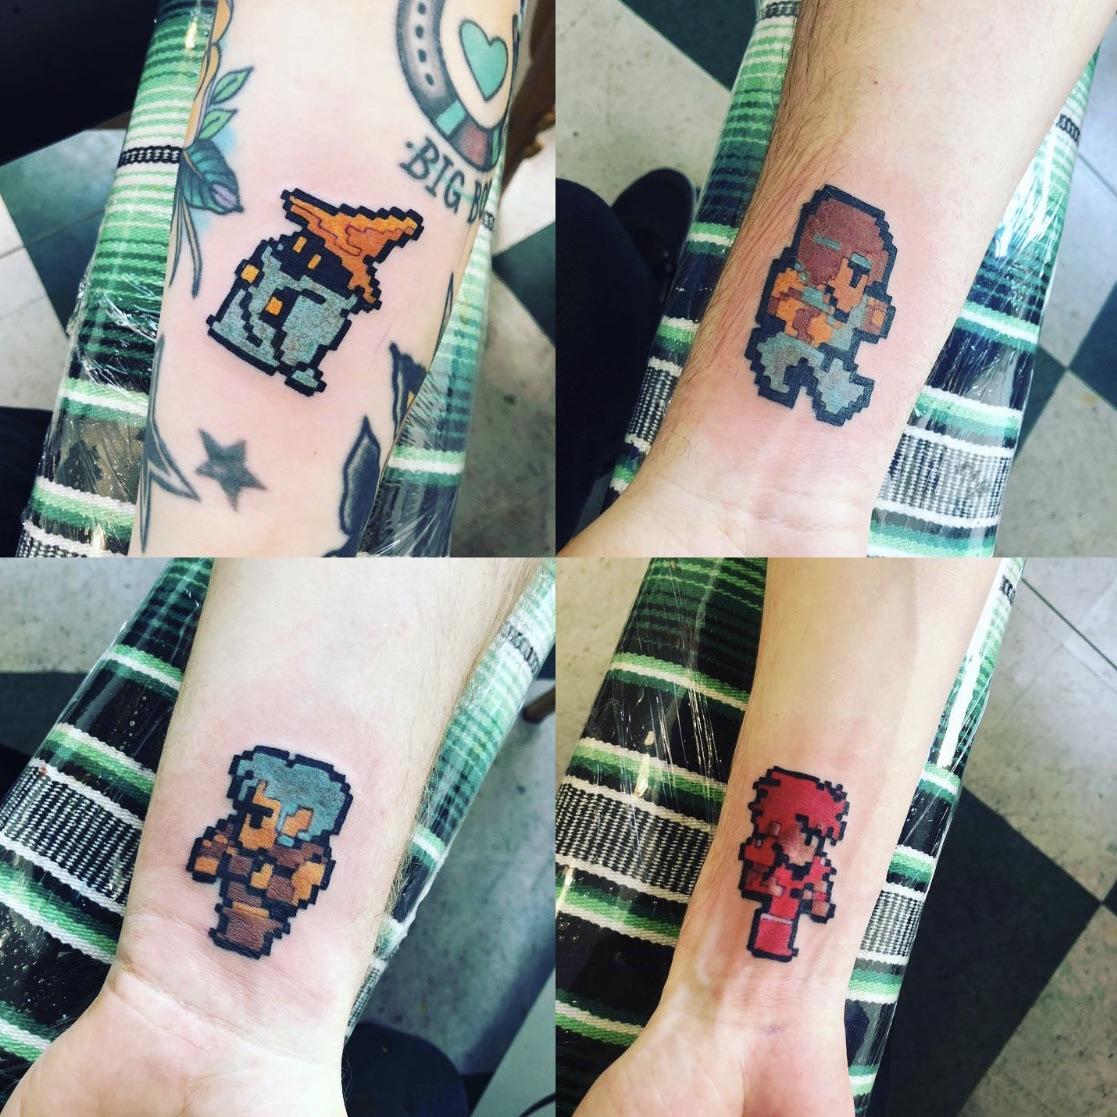 #Geek 🤓 Awesome of the Day: #Videogame @SquareEnix #FinalFantasy #Pixel Characters Forearm #Tattoo via @ShambazzleGames #SamaTattoo #SamaGeek 🎮